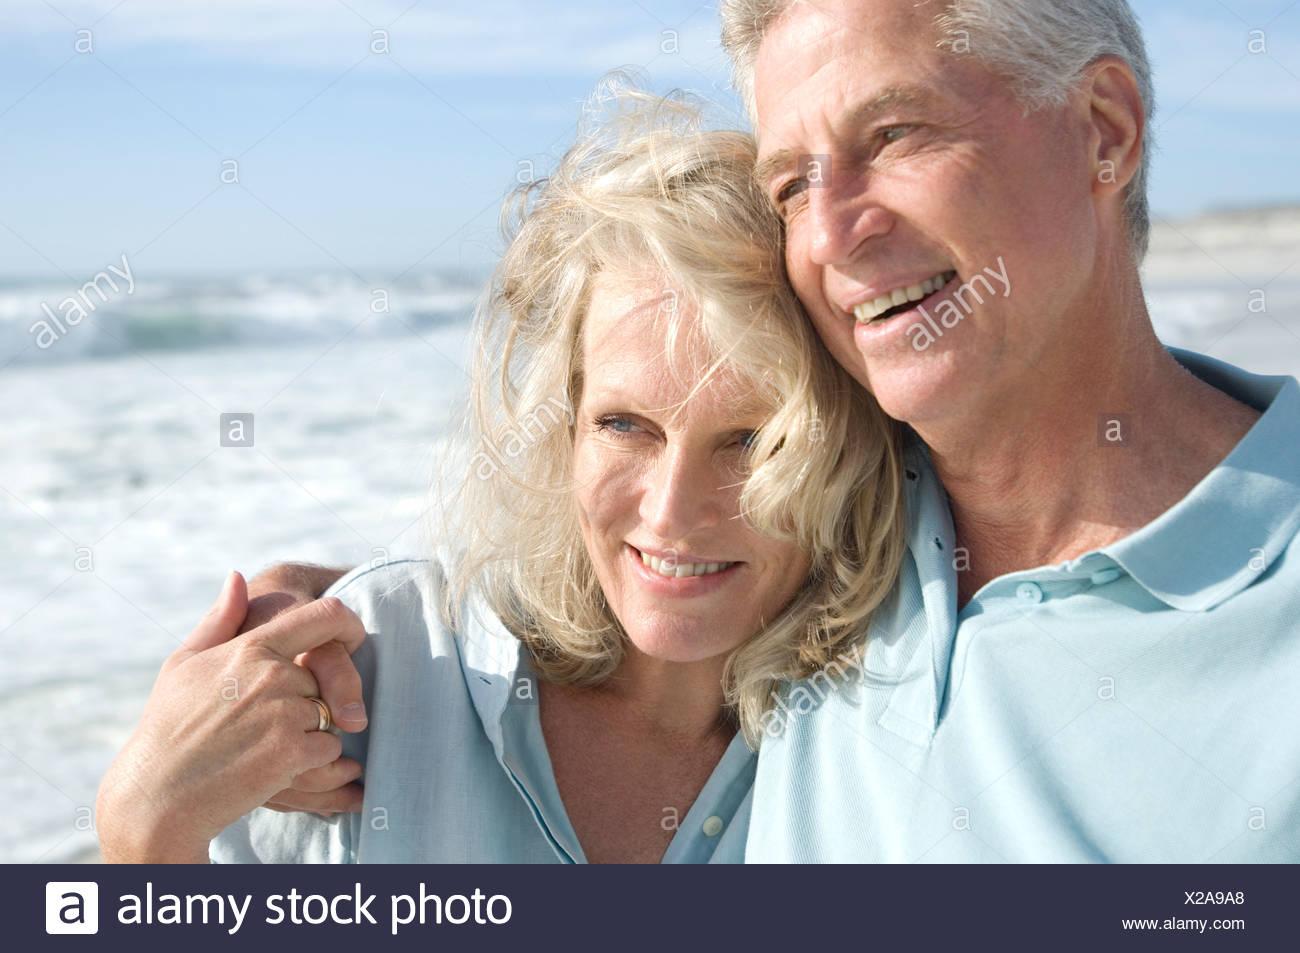 Portrait of smilin couple on the beach Stock Photo